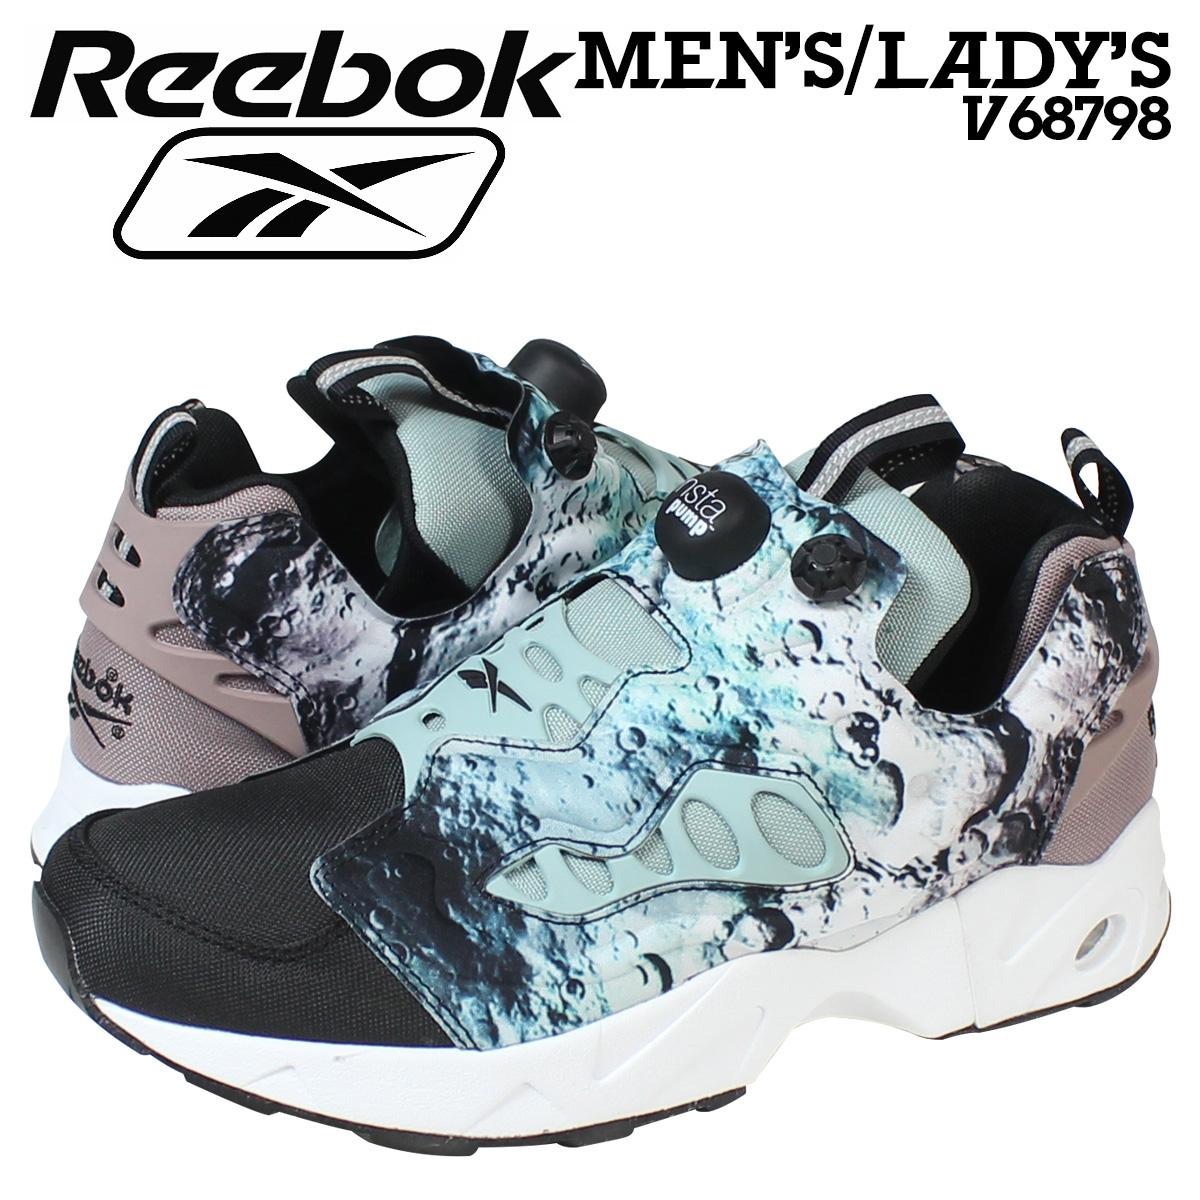 dad89d76a5f2e5 ALLSPORTS  Reebok Reebok insta pump fury sneakers INSTAPUMP FURY ...